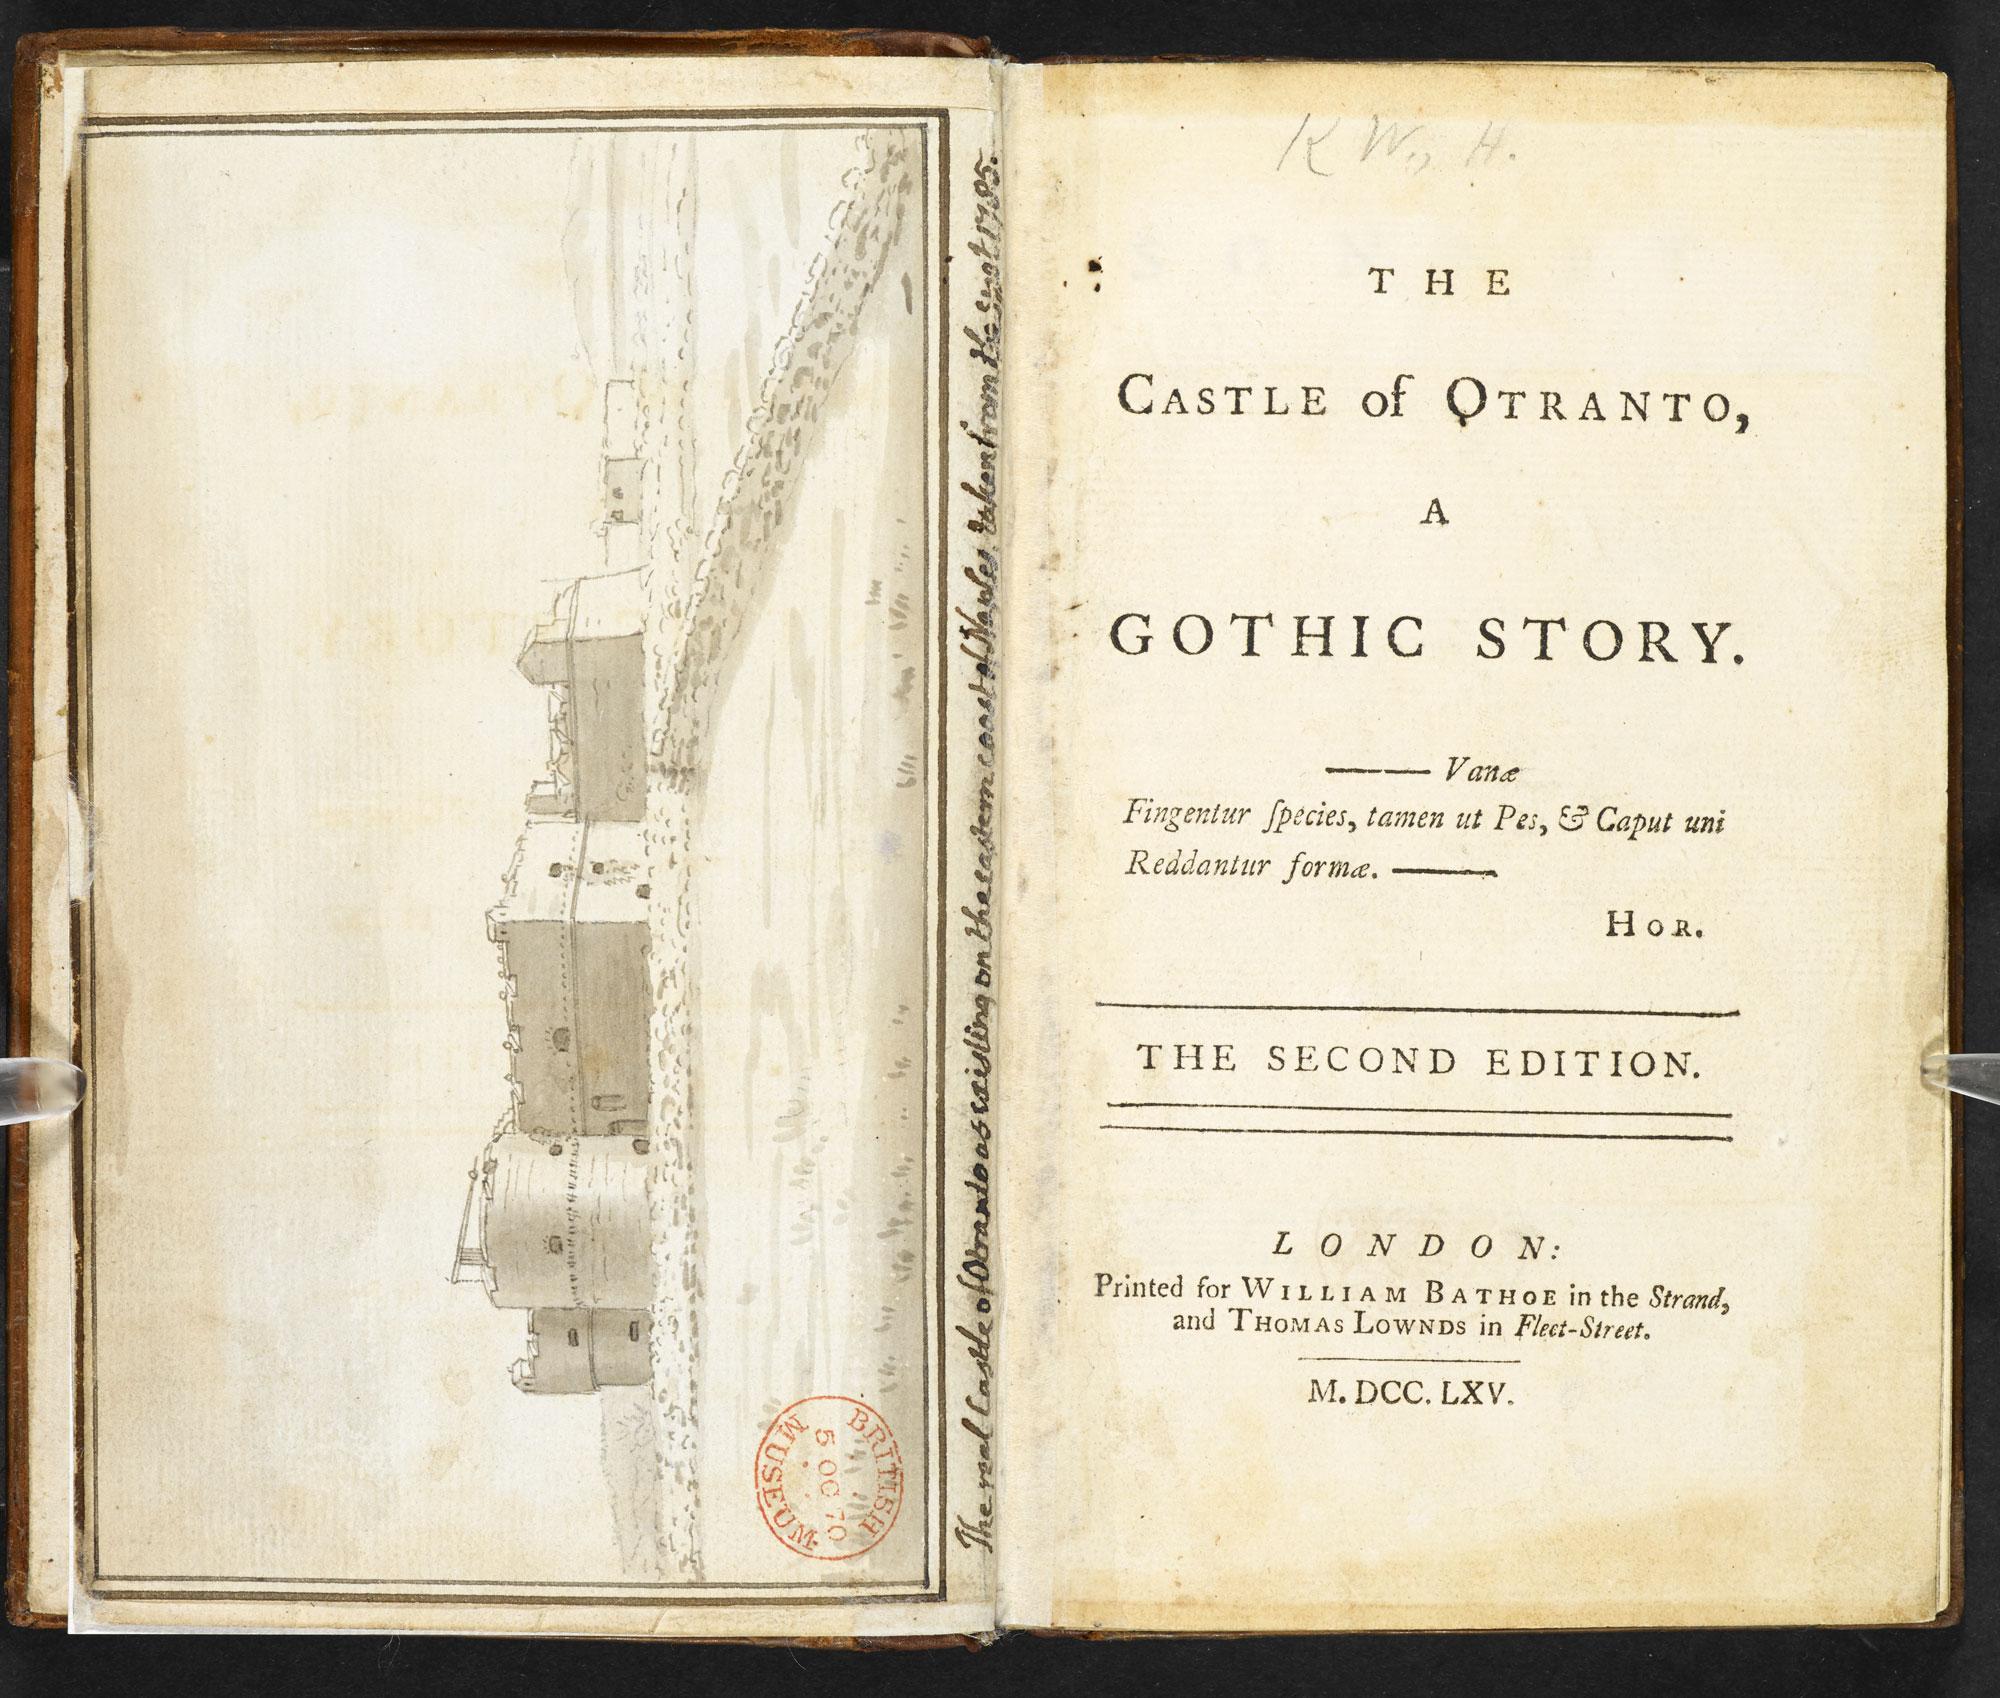 Walpole, Horace. The Castle of Otranto . London: William Bathoe. 1764.